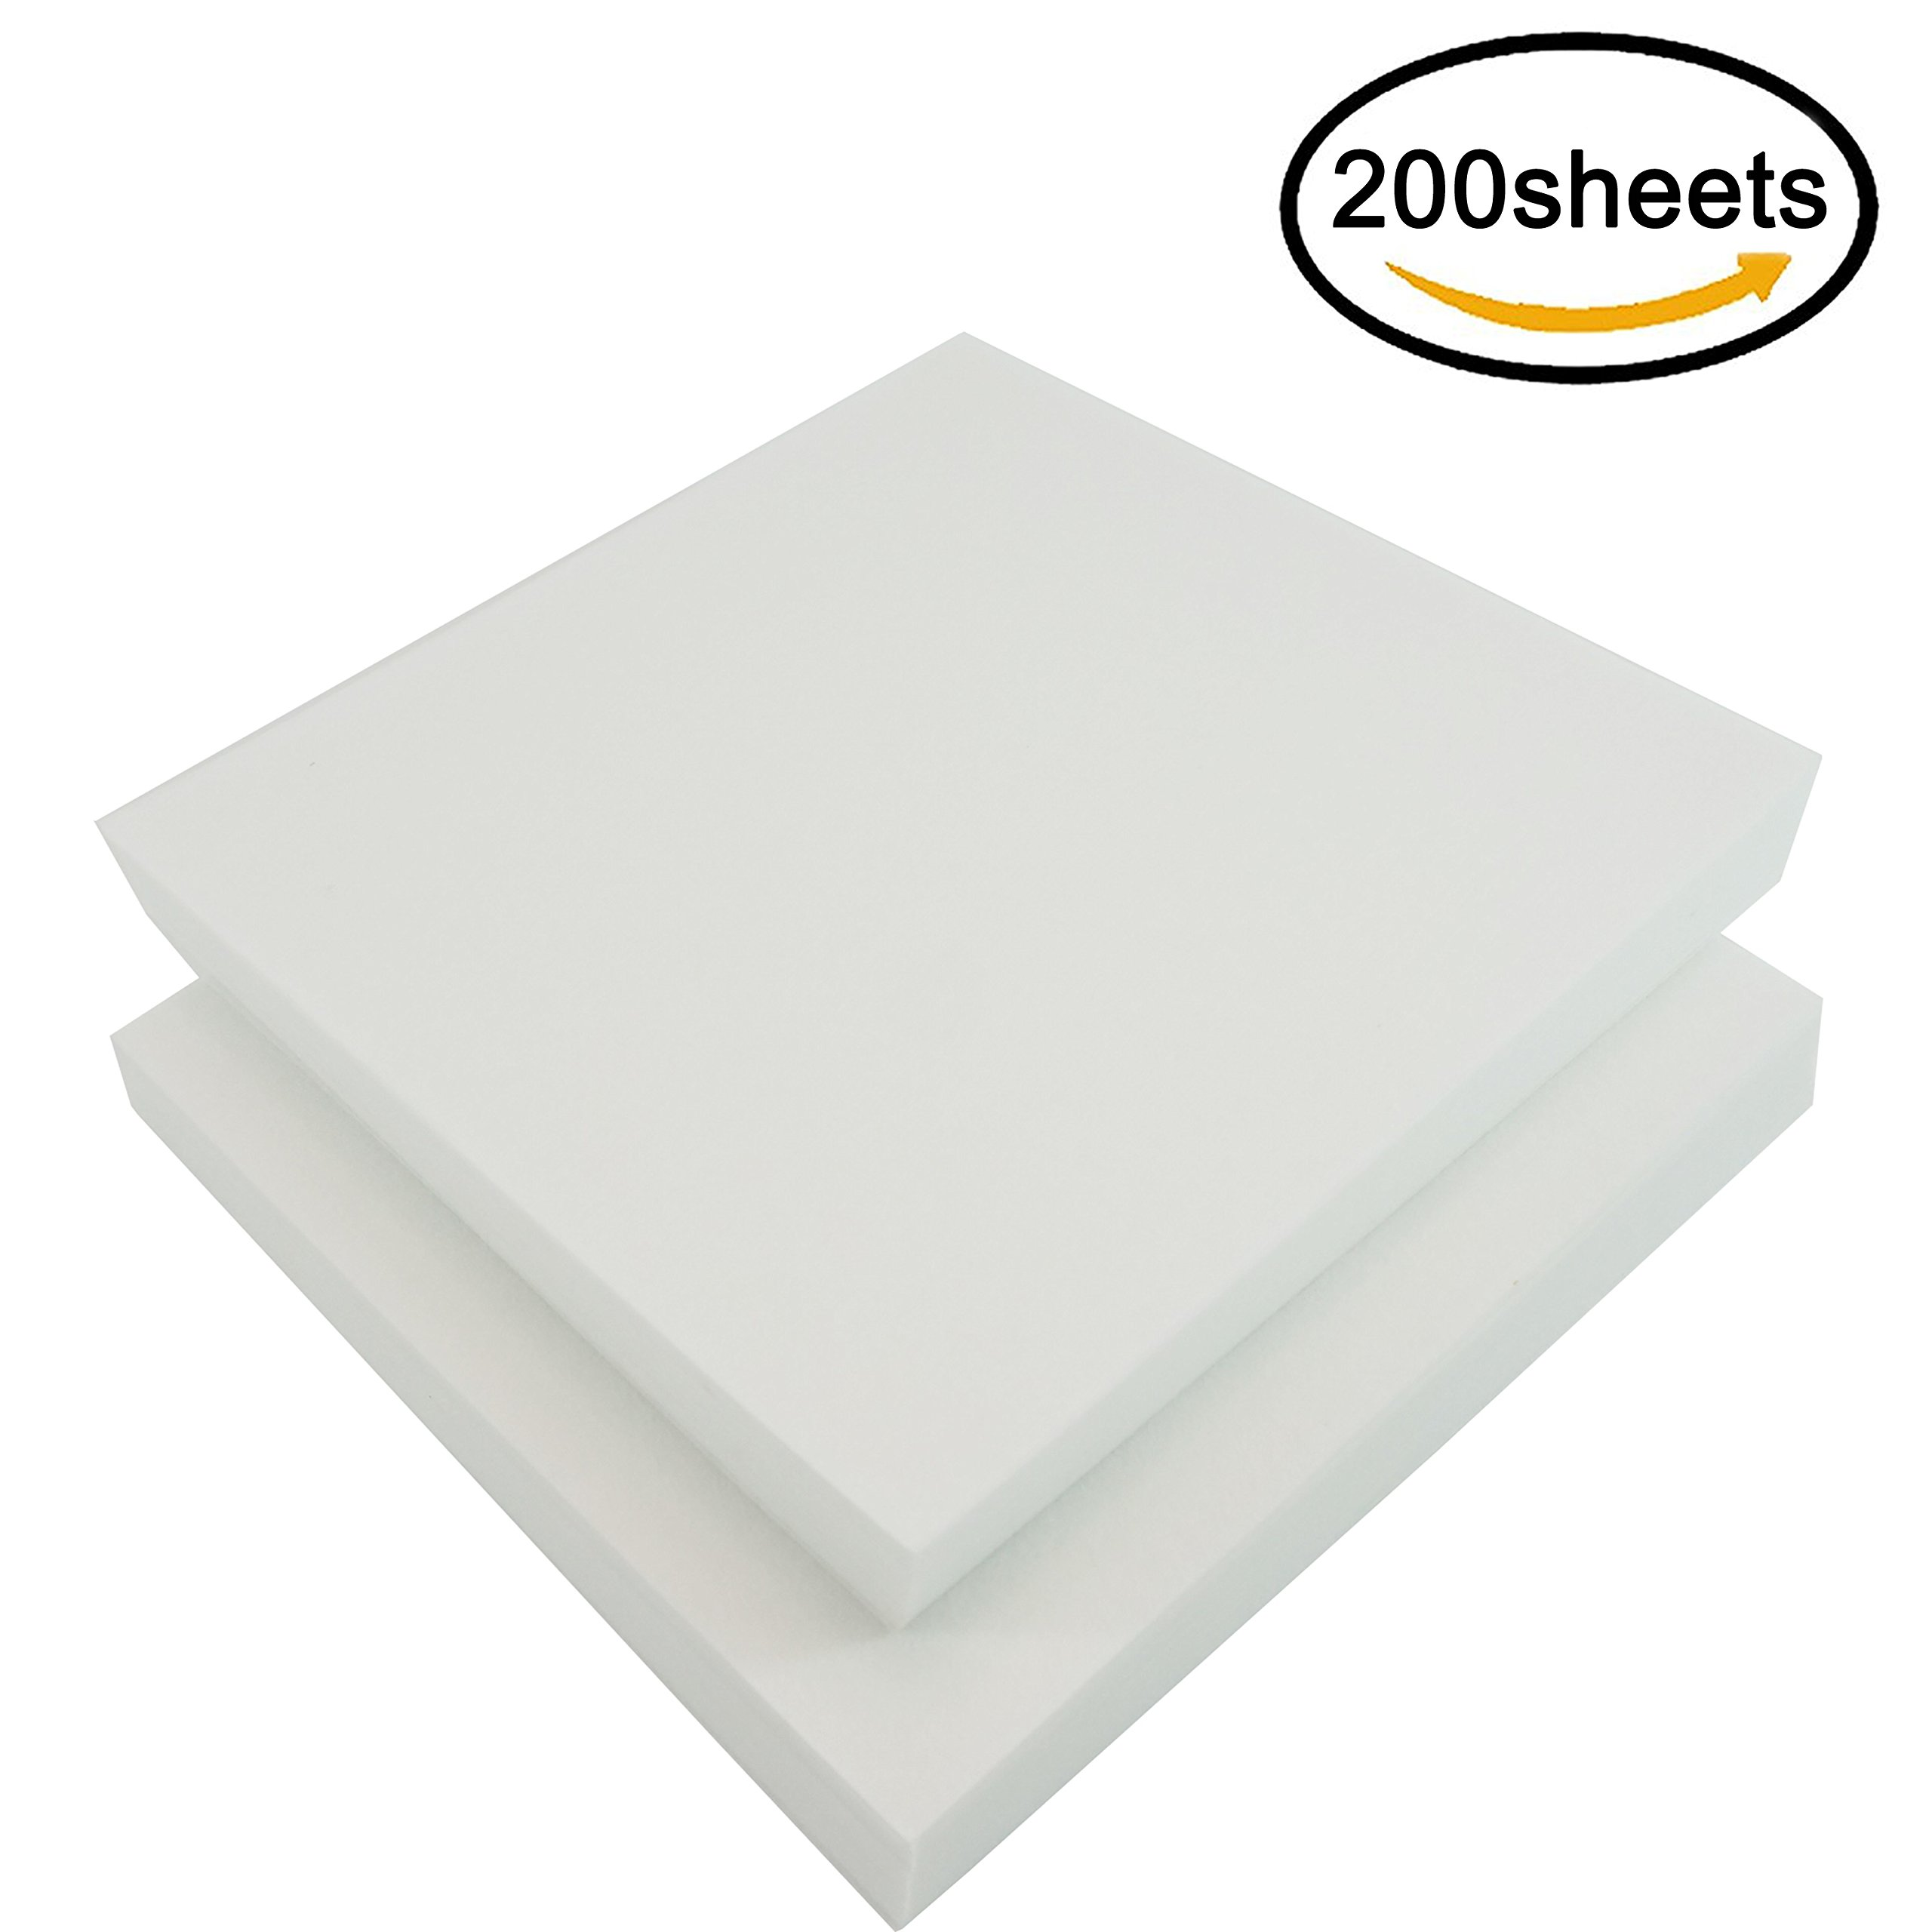 Cheap 4x8 Plexiglass Sheets, find 4x8 Plexiglass Sheets deals on ...